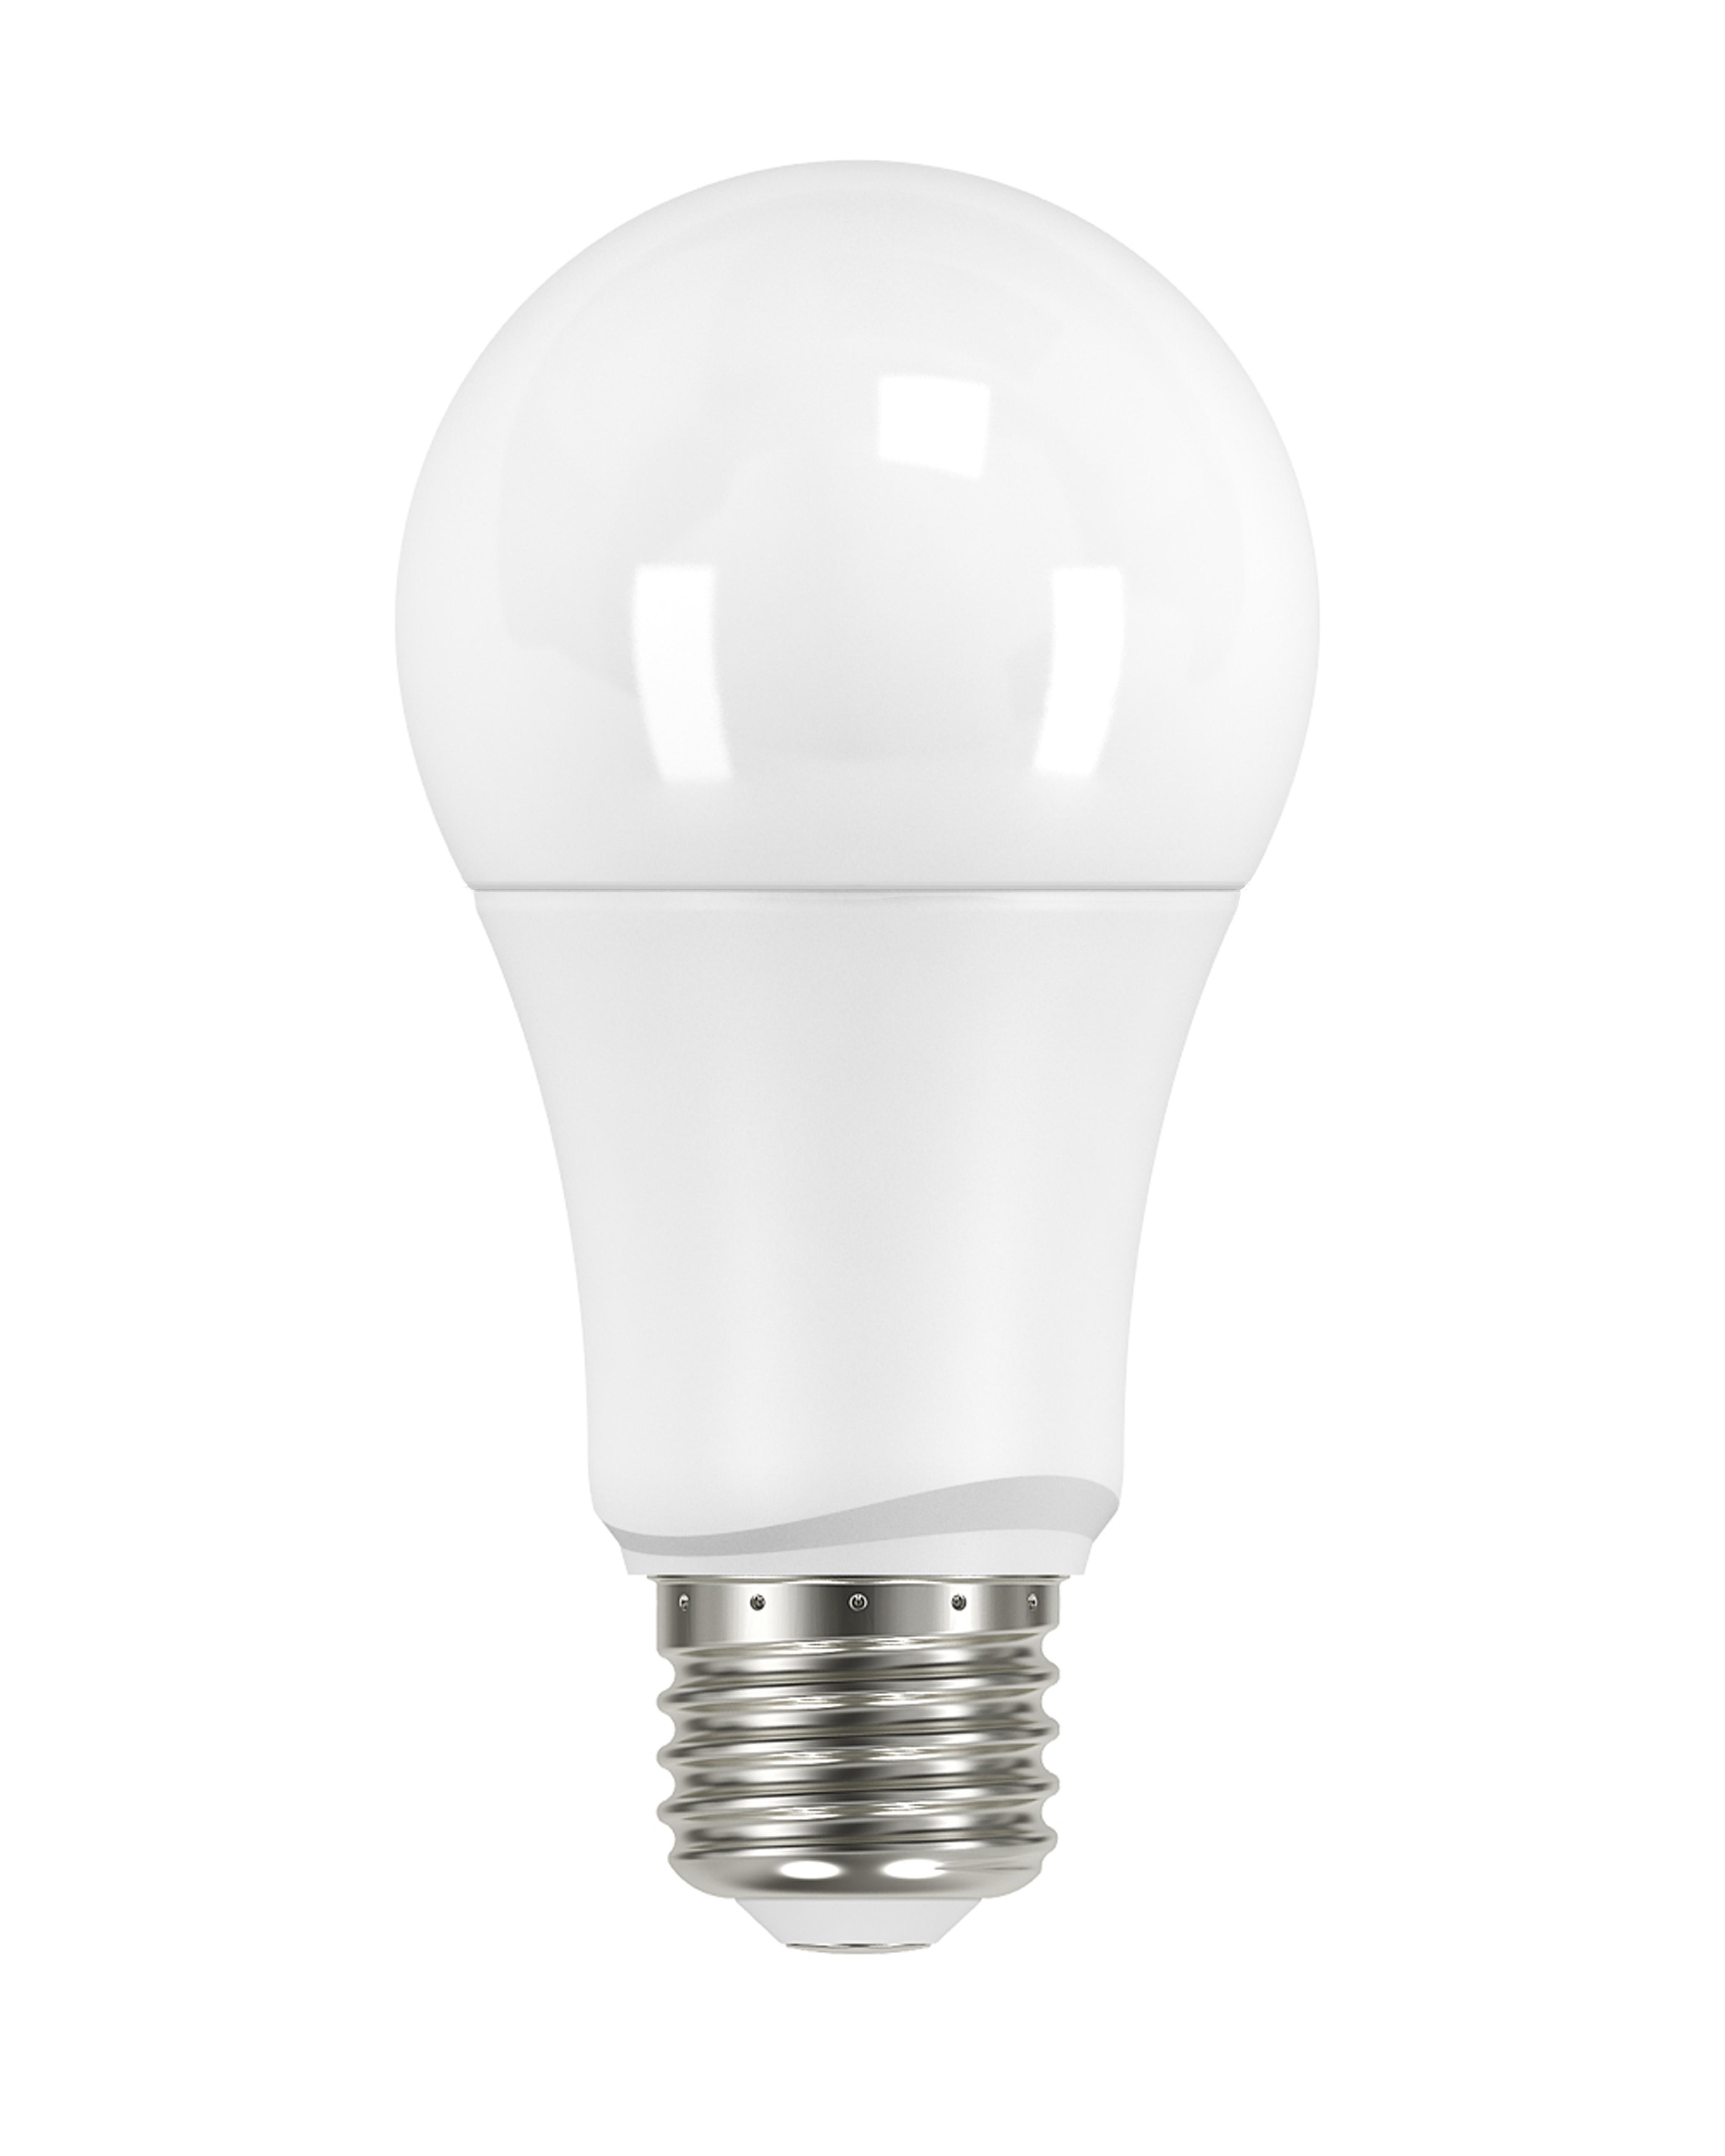 SATCO S9594 9.5A19/LED/3000K/120V